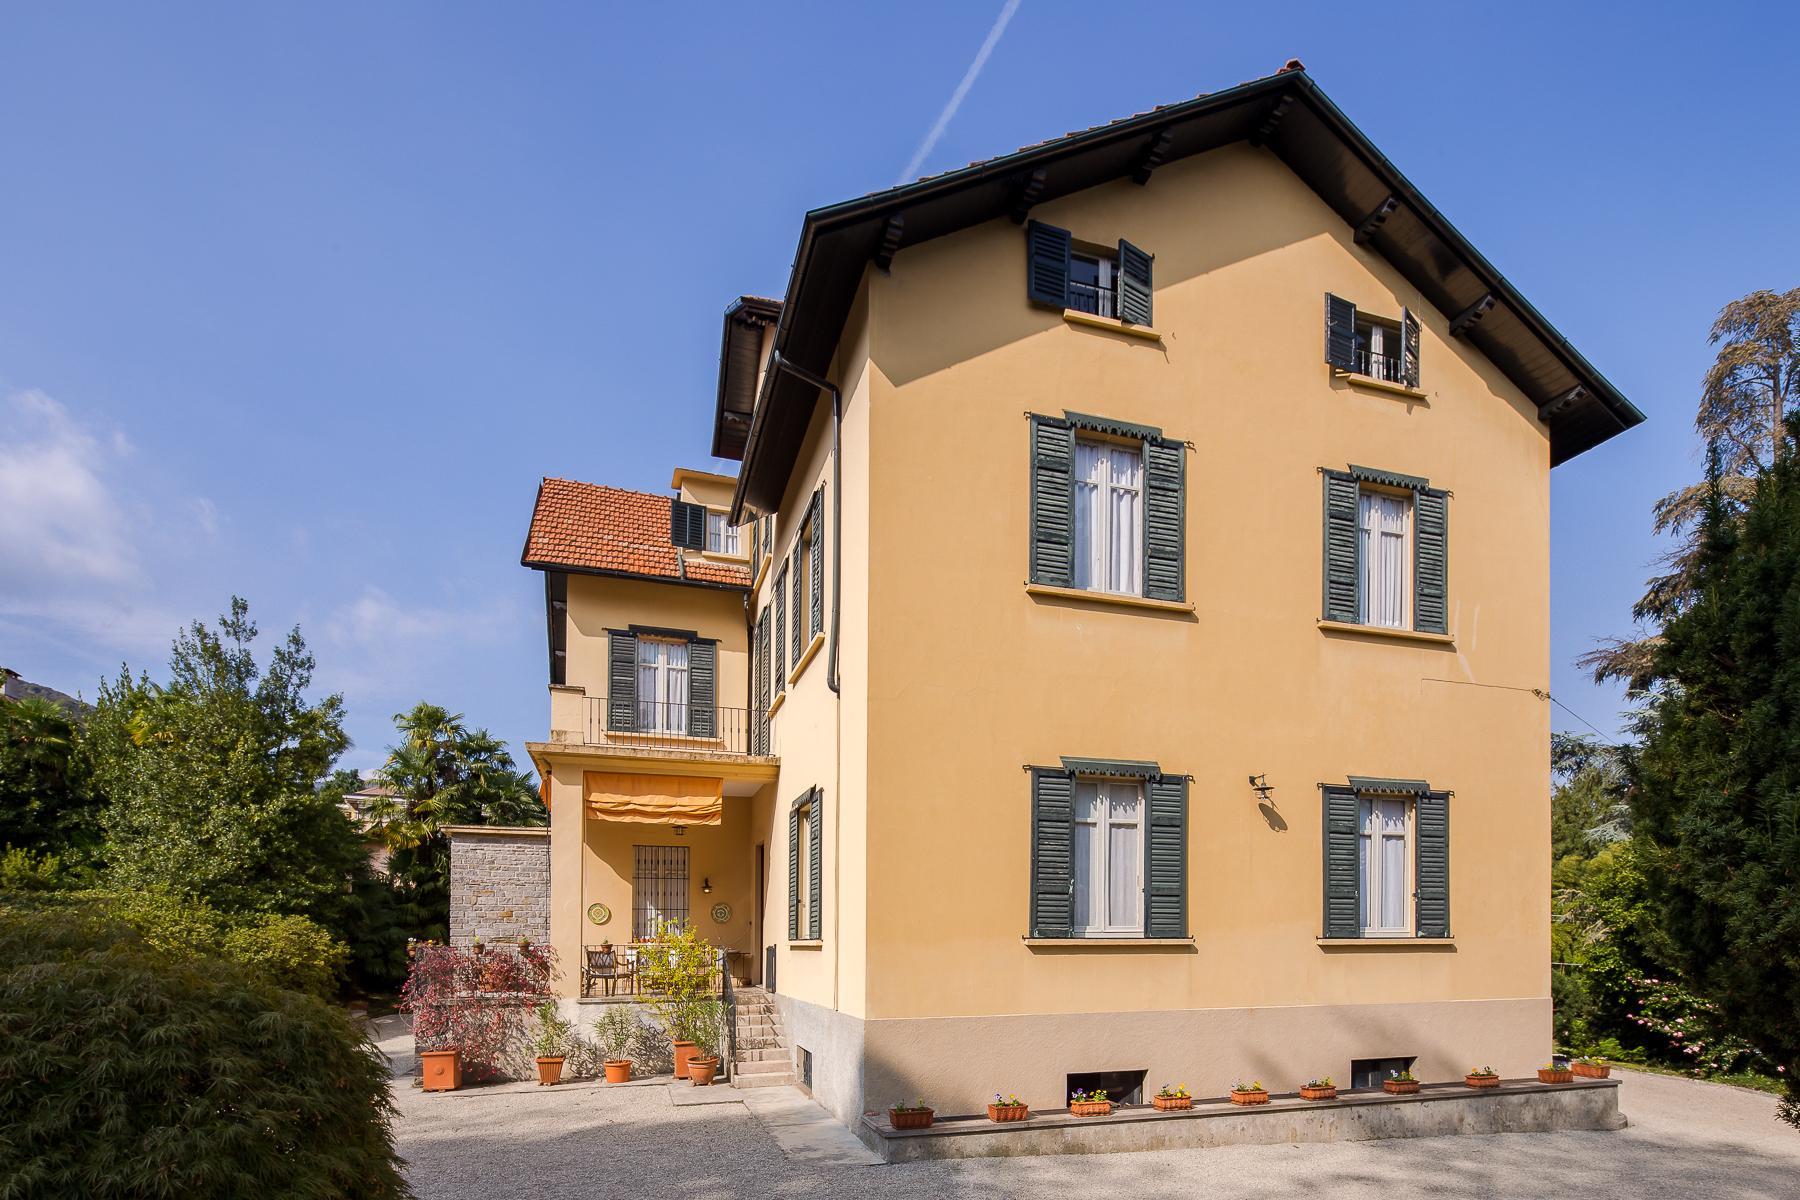 Stresa的历史中心的别墅 - 9